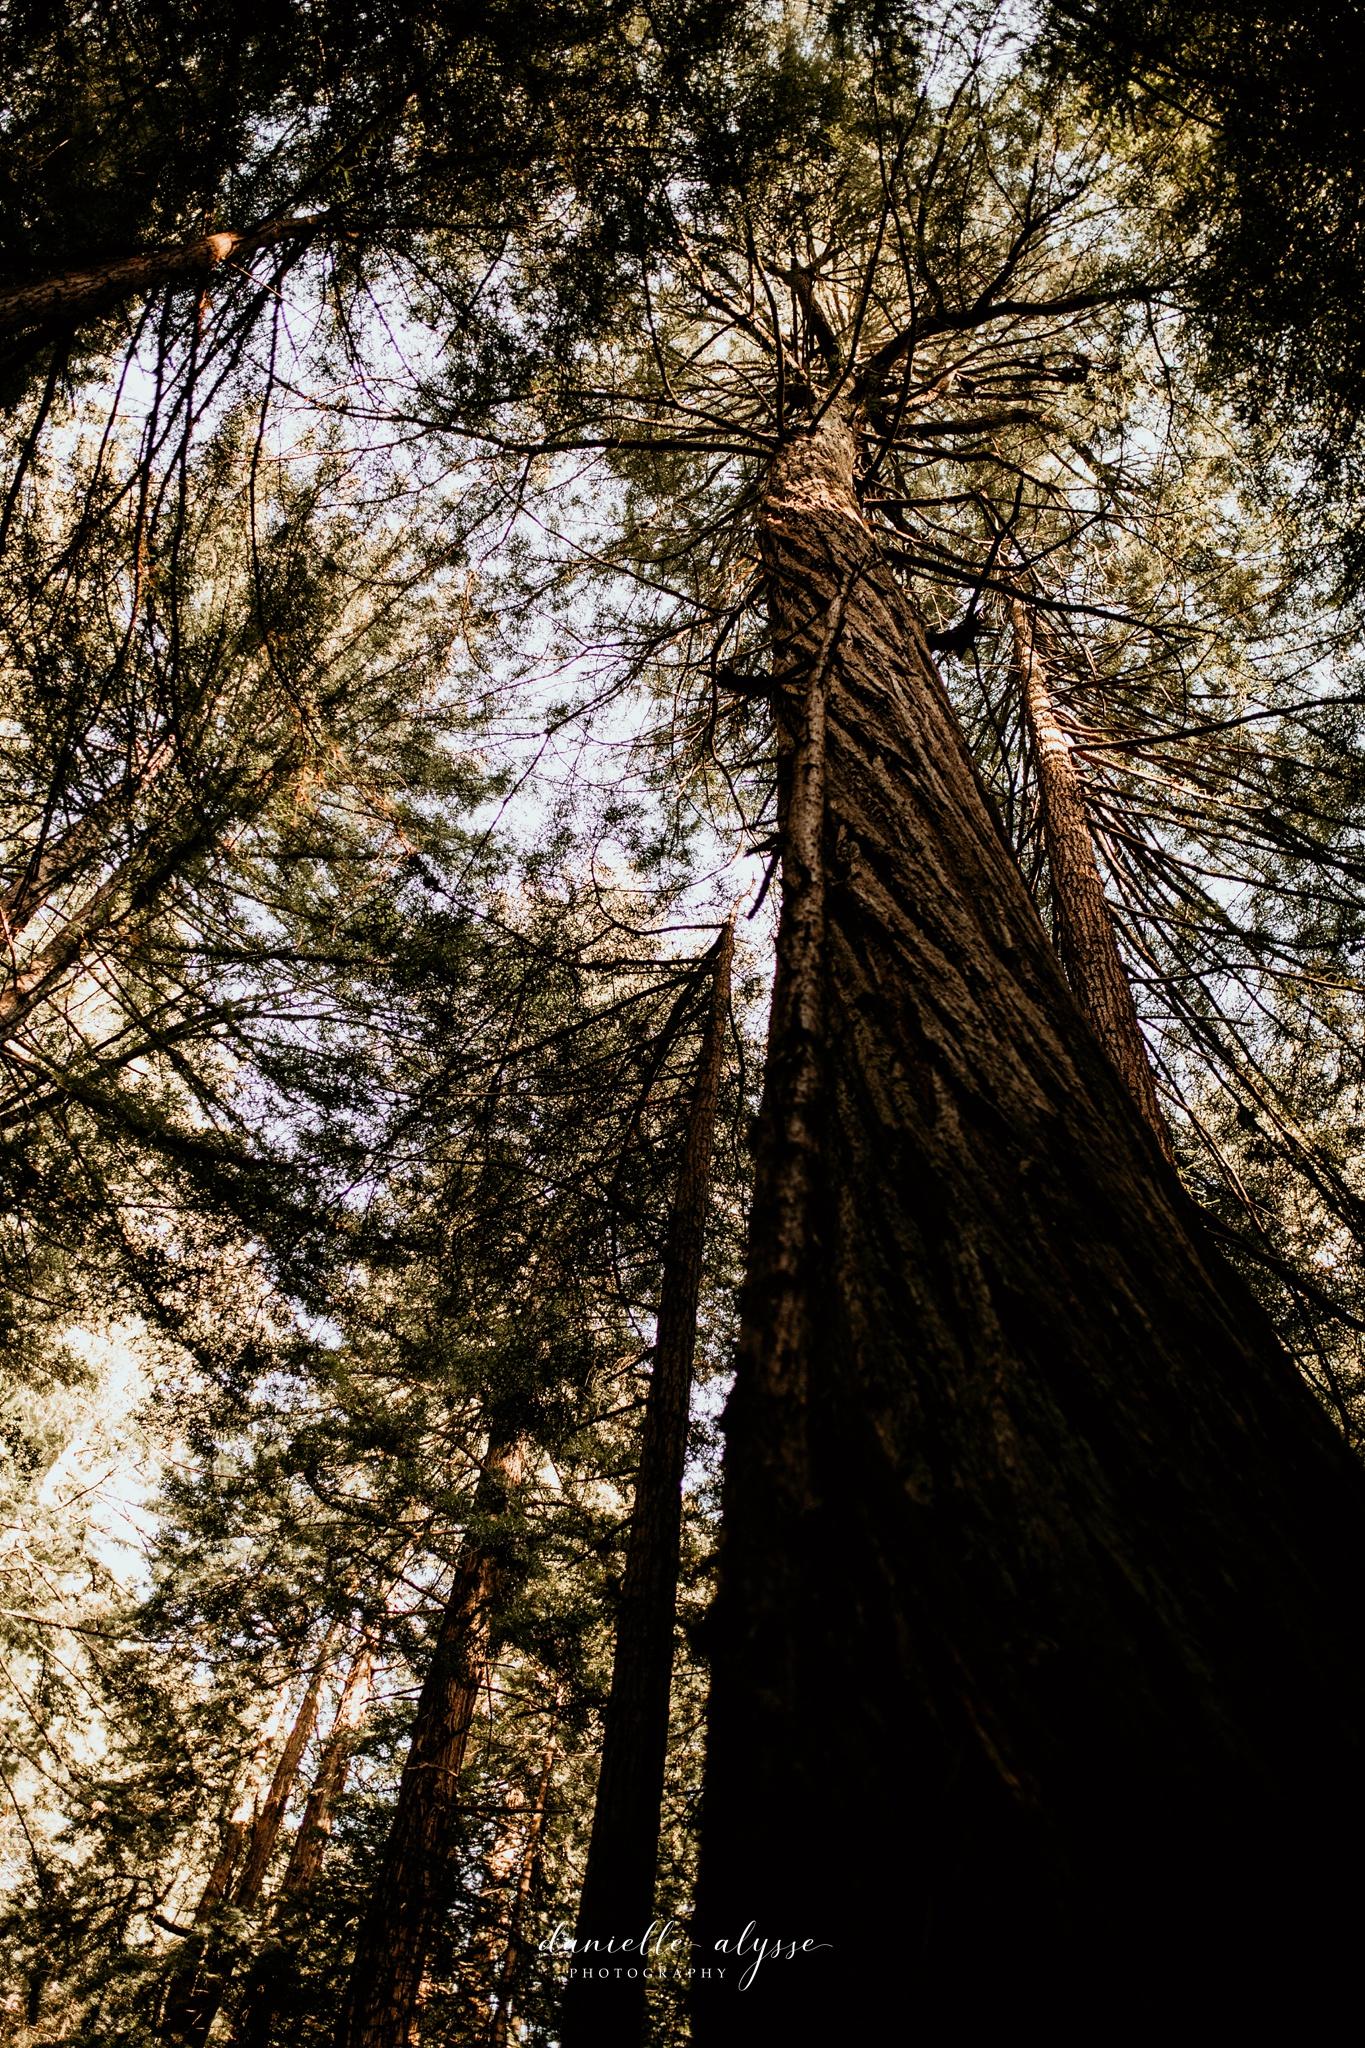 180503_engagement_bianca_muir_woods_mill_valley_danielle_alysse_photography_bay_area_photographer_blog_18_WEB.jpg